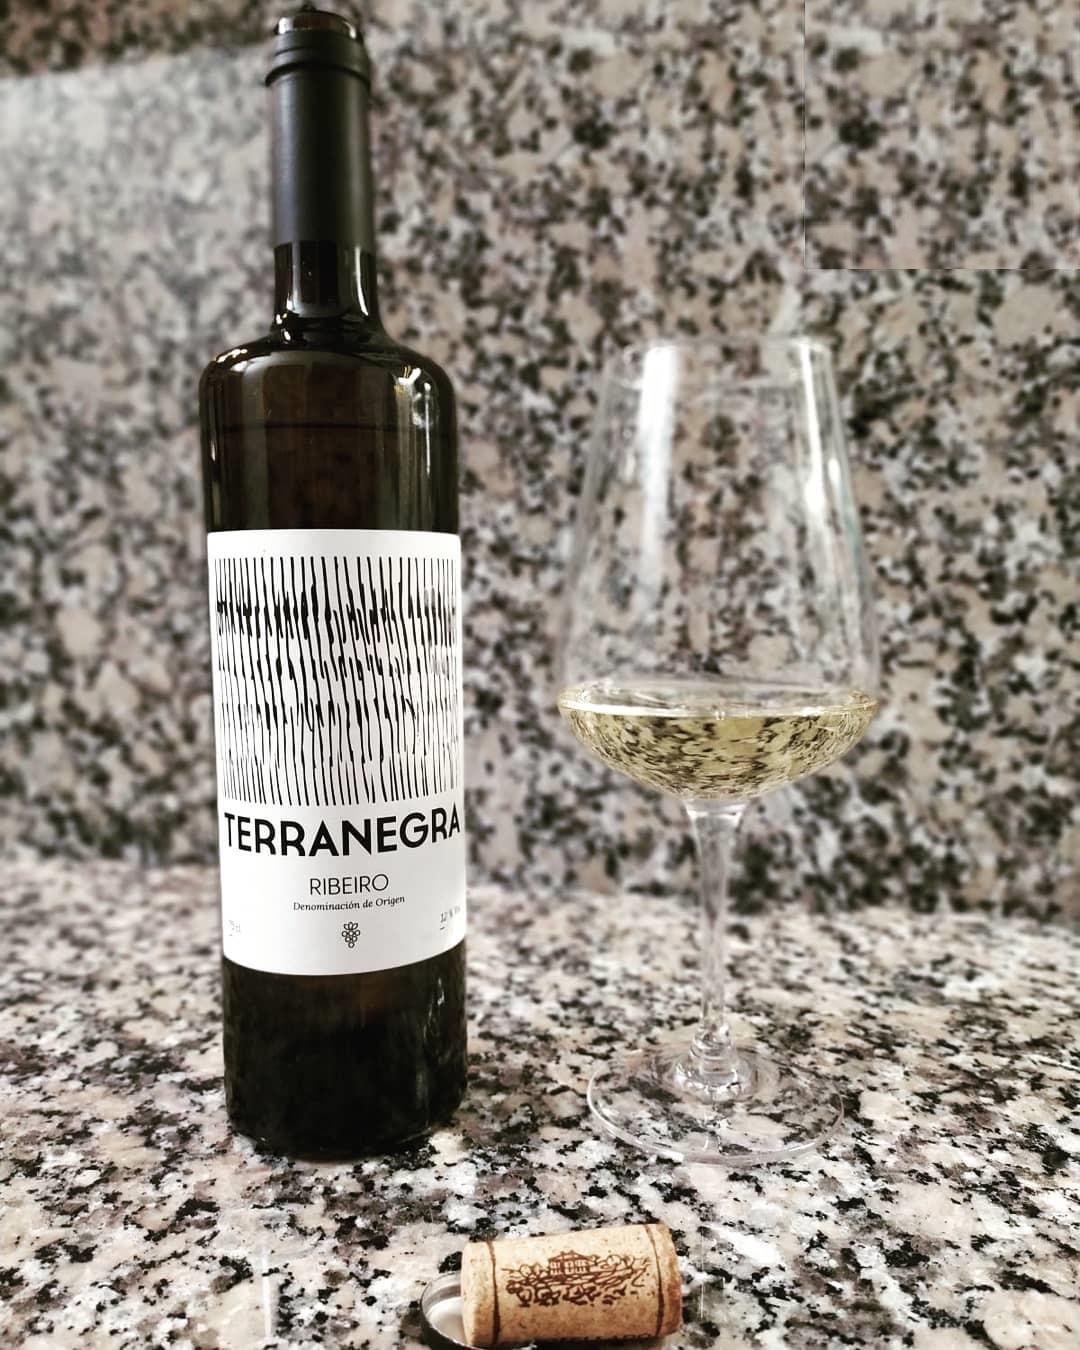 Terranegra 2017